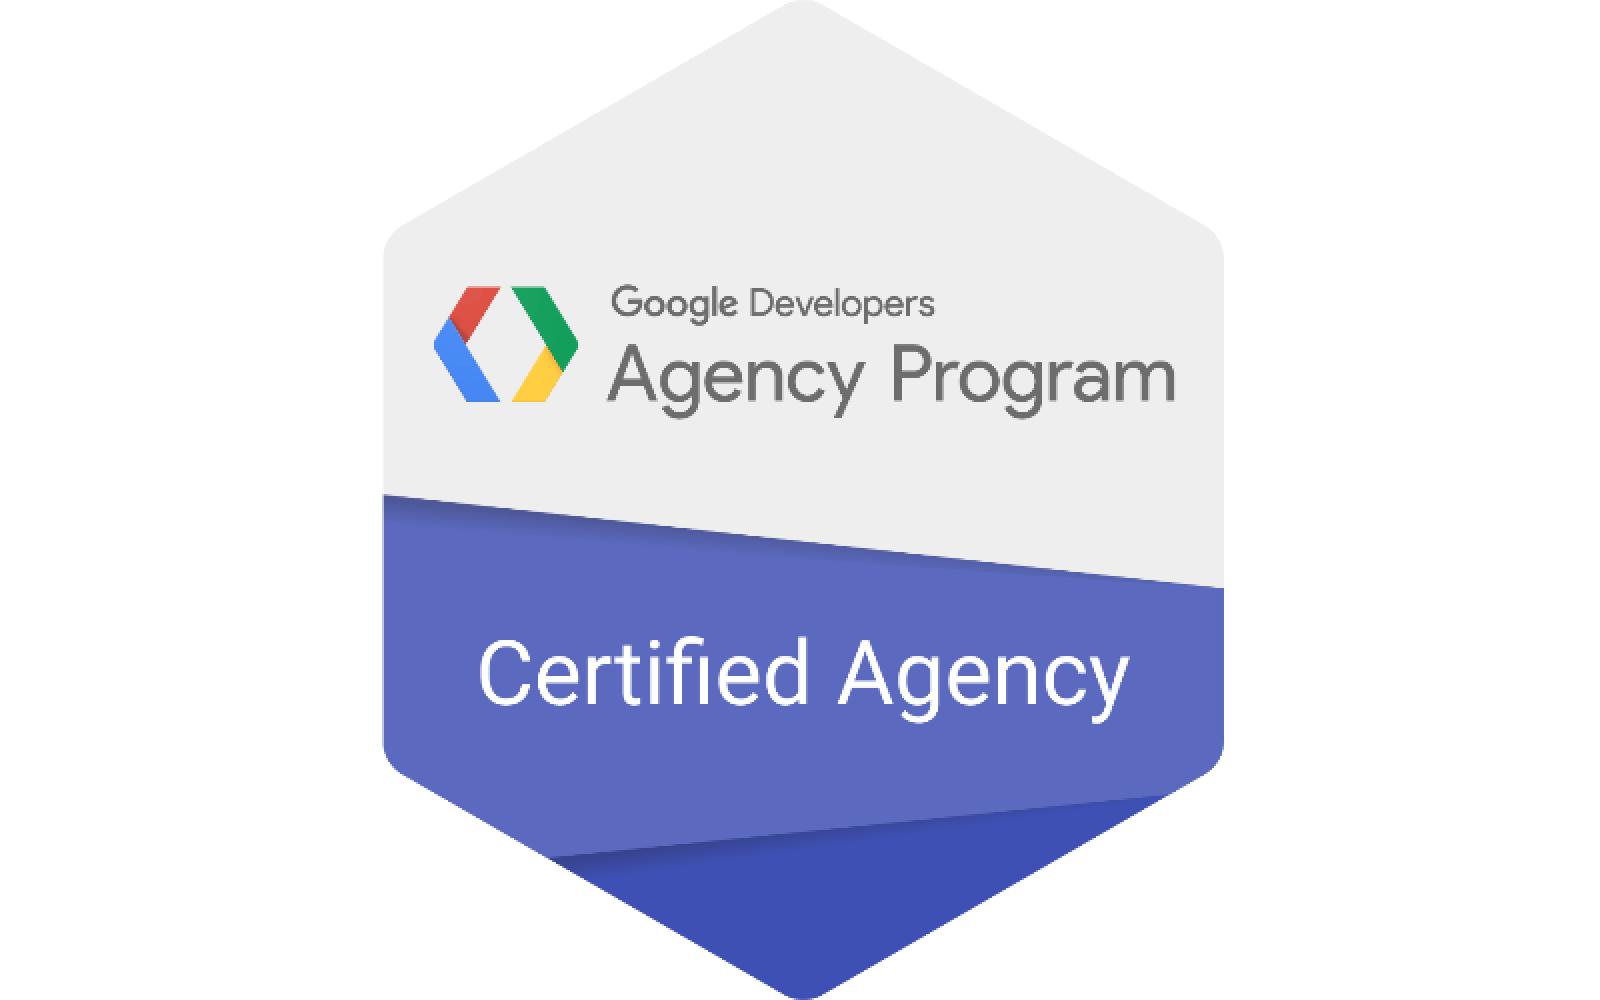 Google Launches Certification Program To Recognize App Development